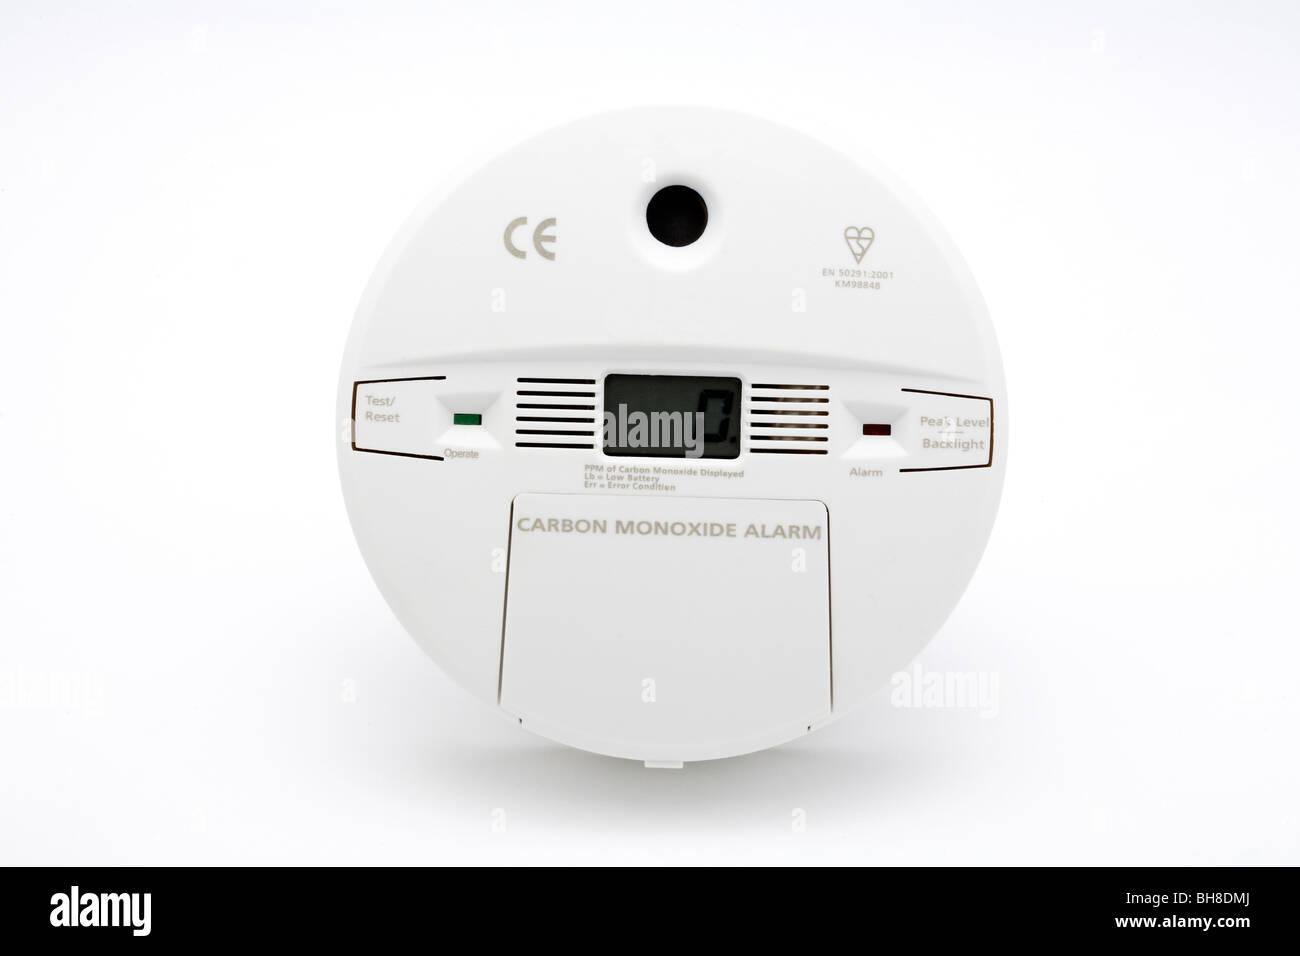 Carbon Monoxide Gas Alarm Battery Powered - Stock Image